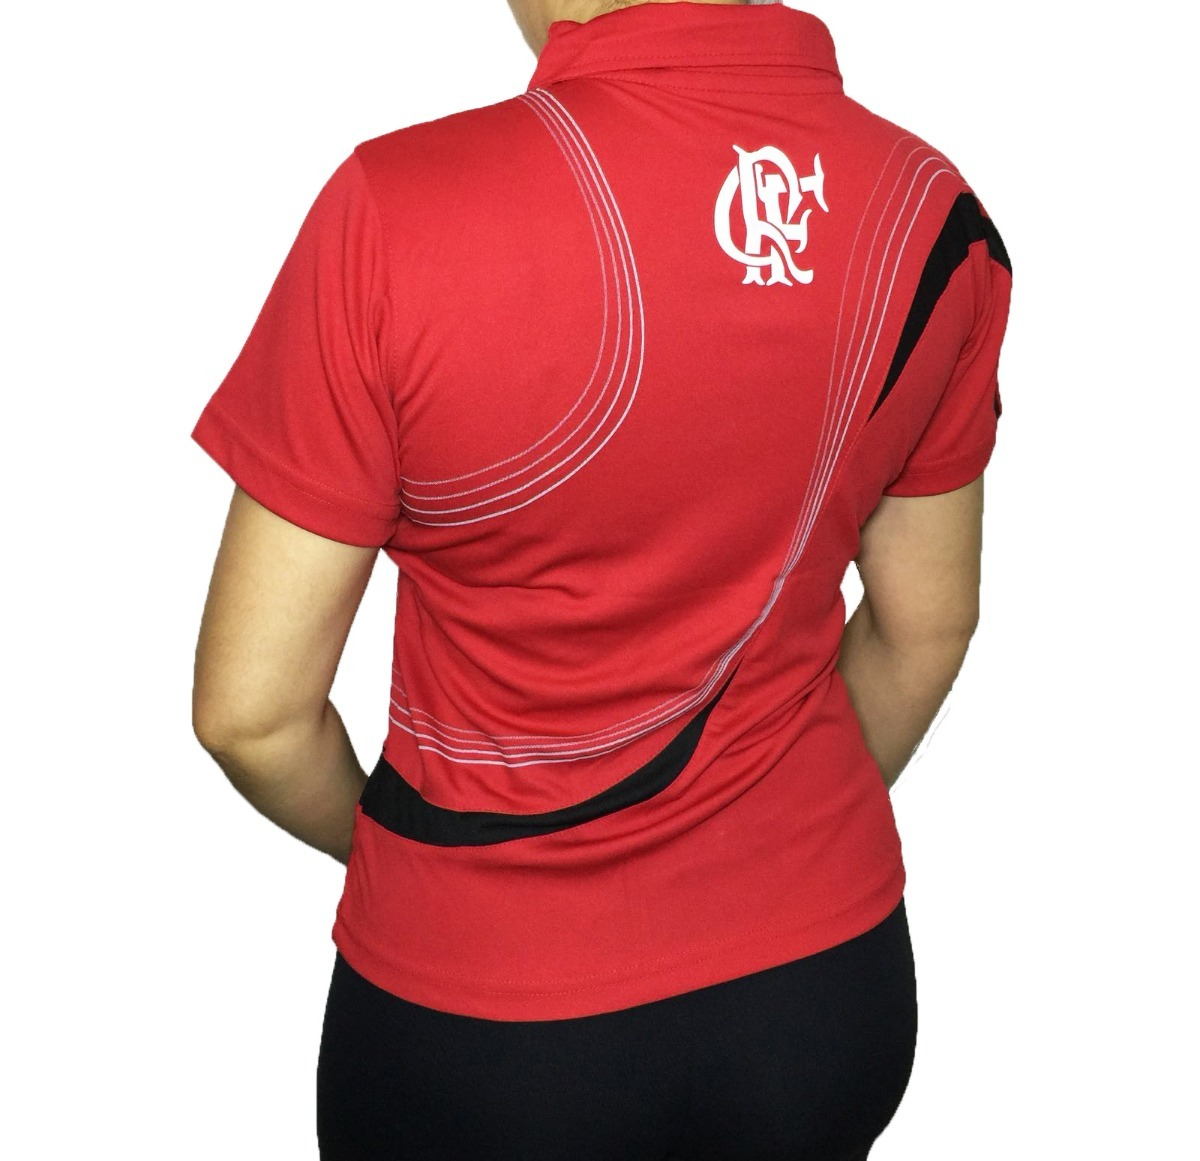 camisa polo do flamengo baby look feminina oficial. Carregando zoom. fb8af23df9820